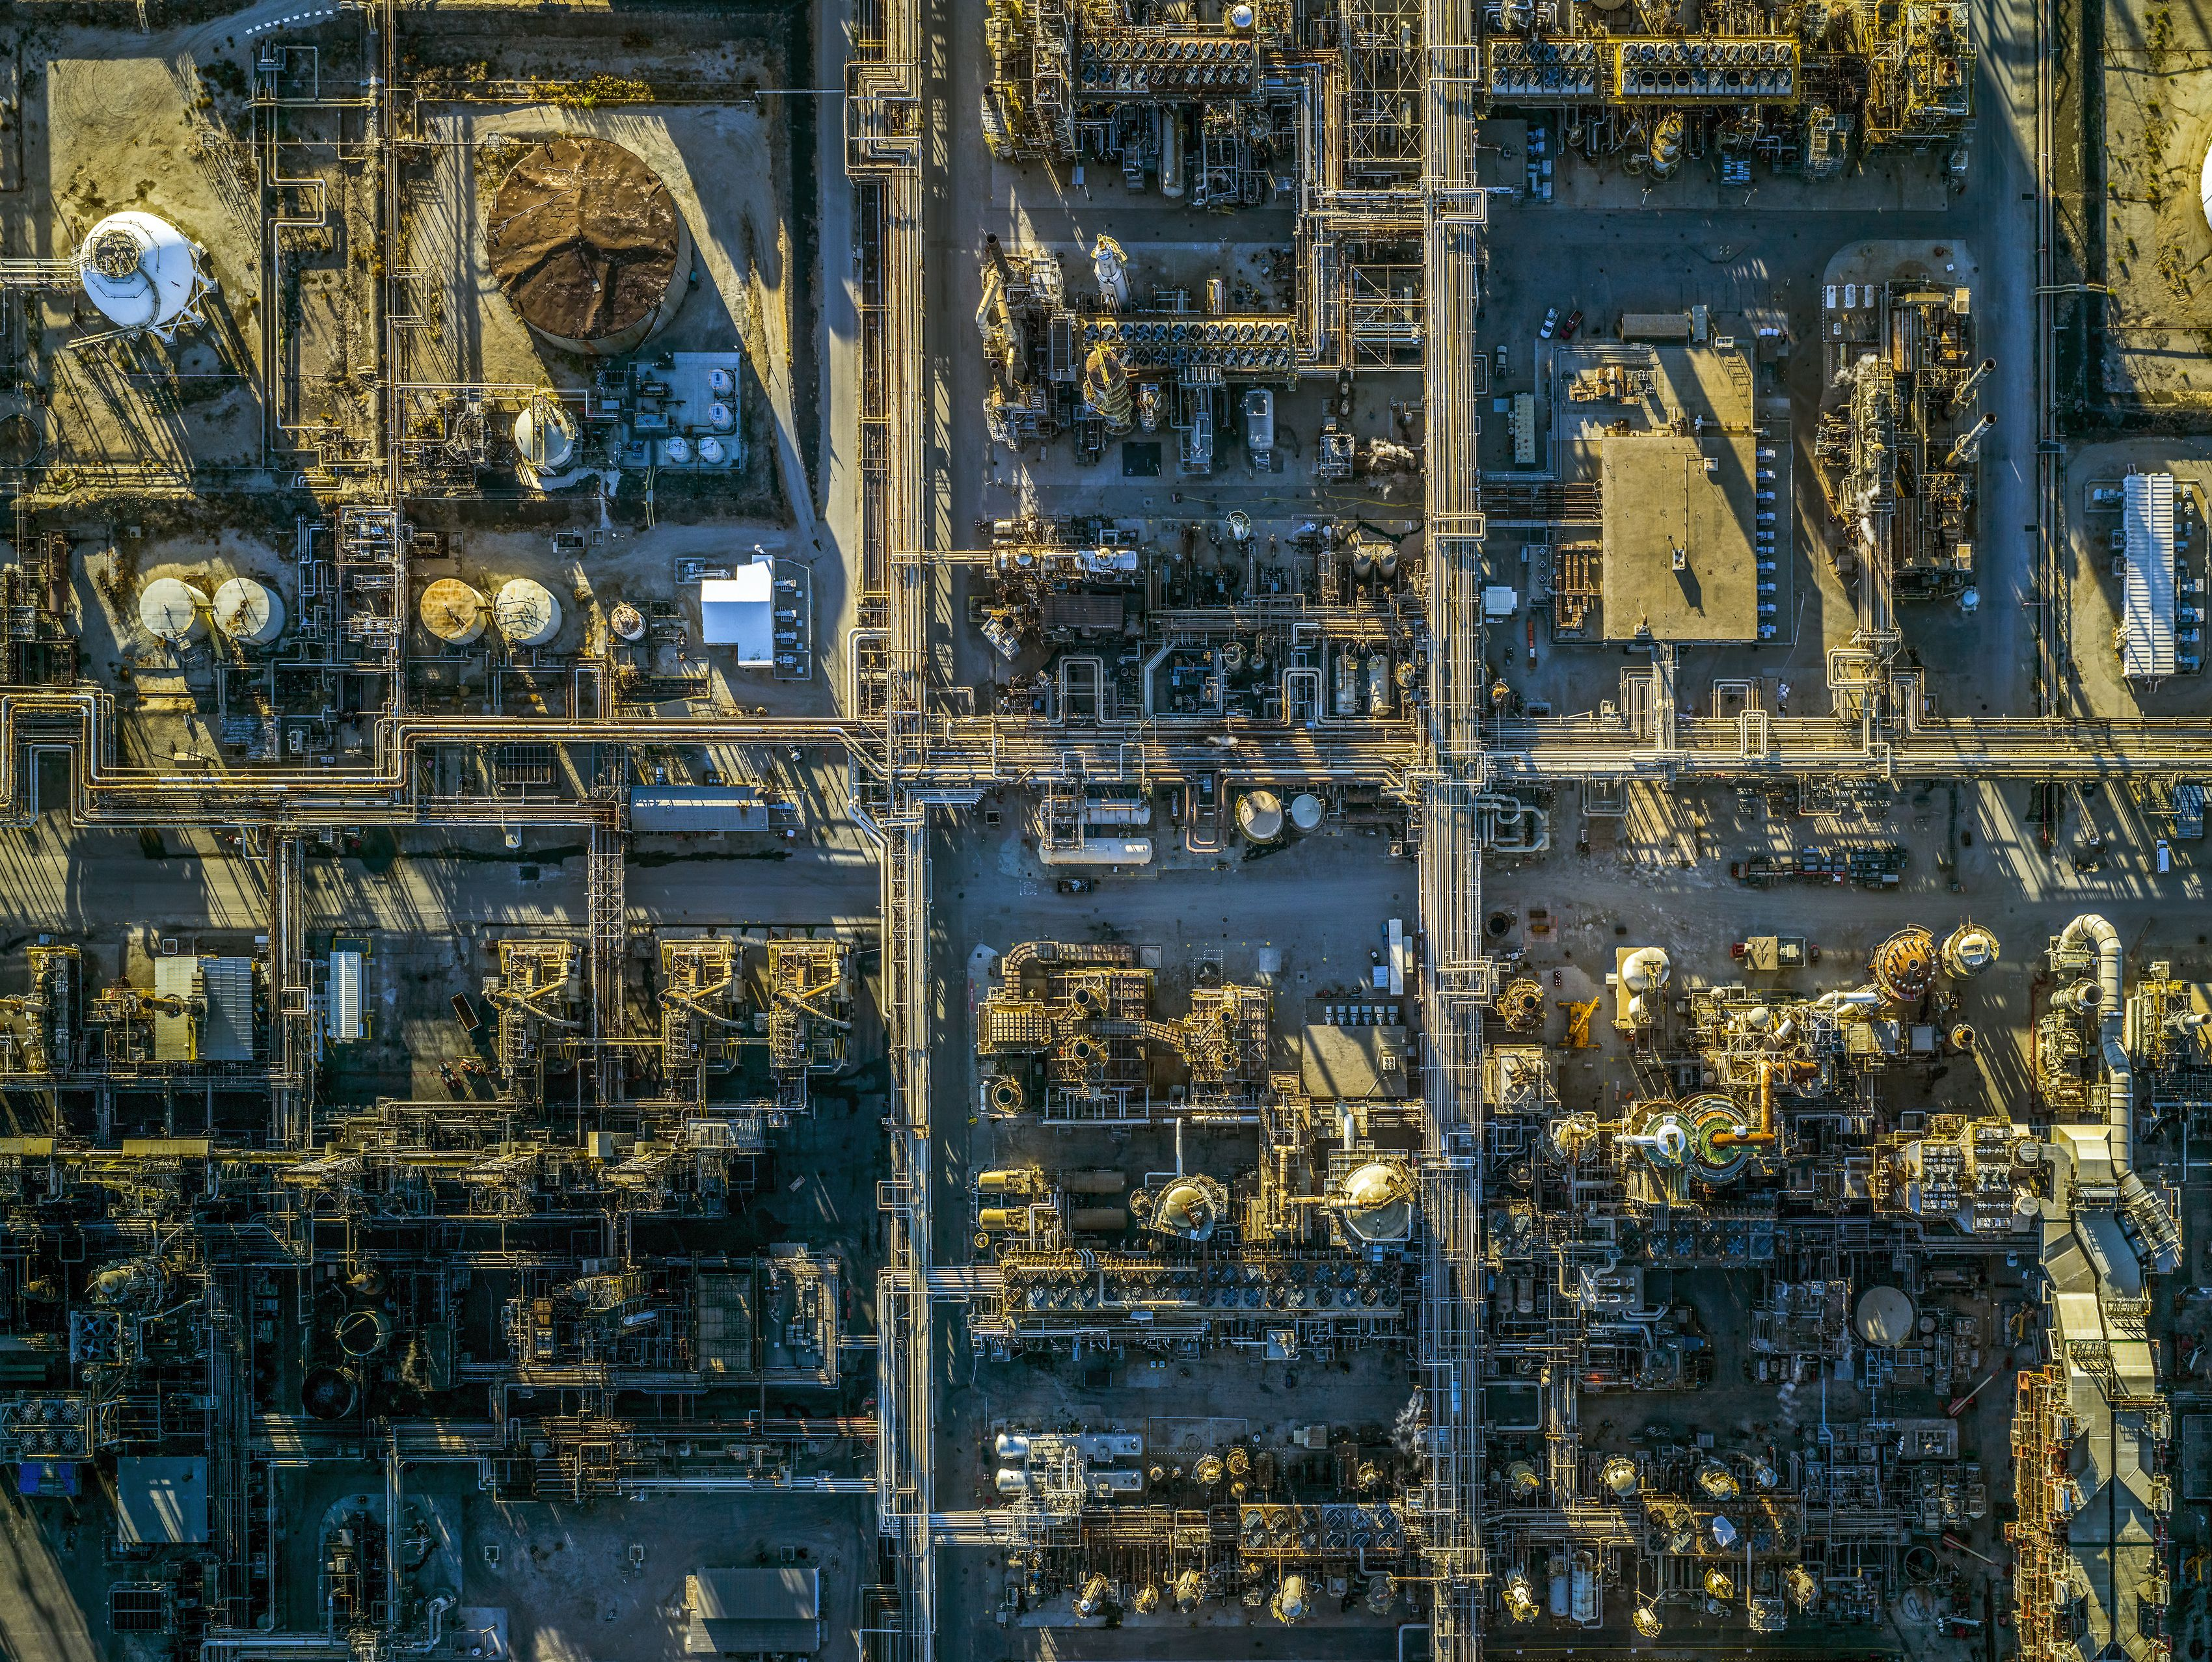 Exxon Mobil Refinery, Torrance, Calif., 2016